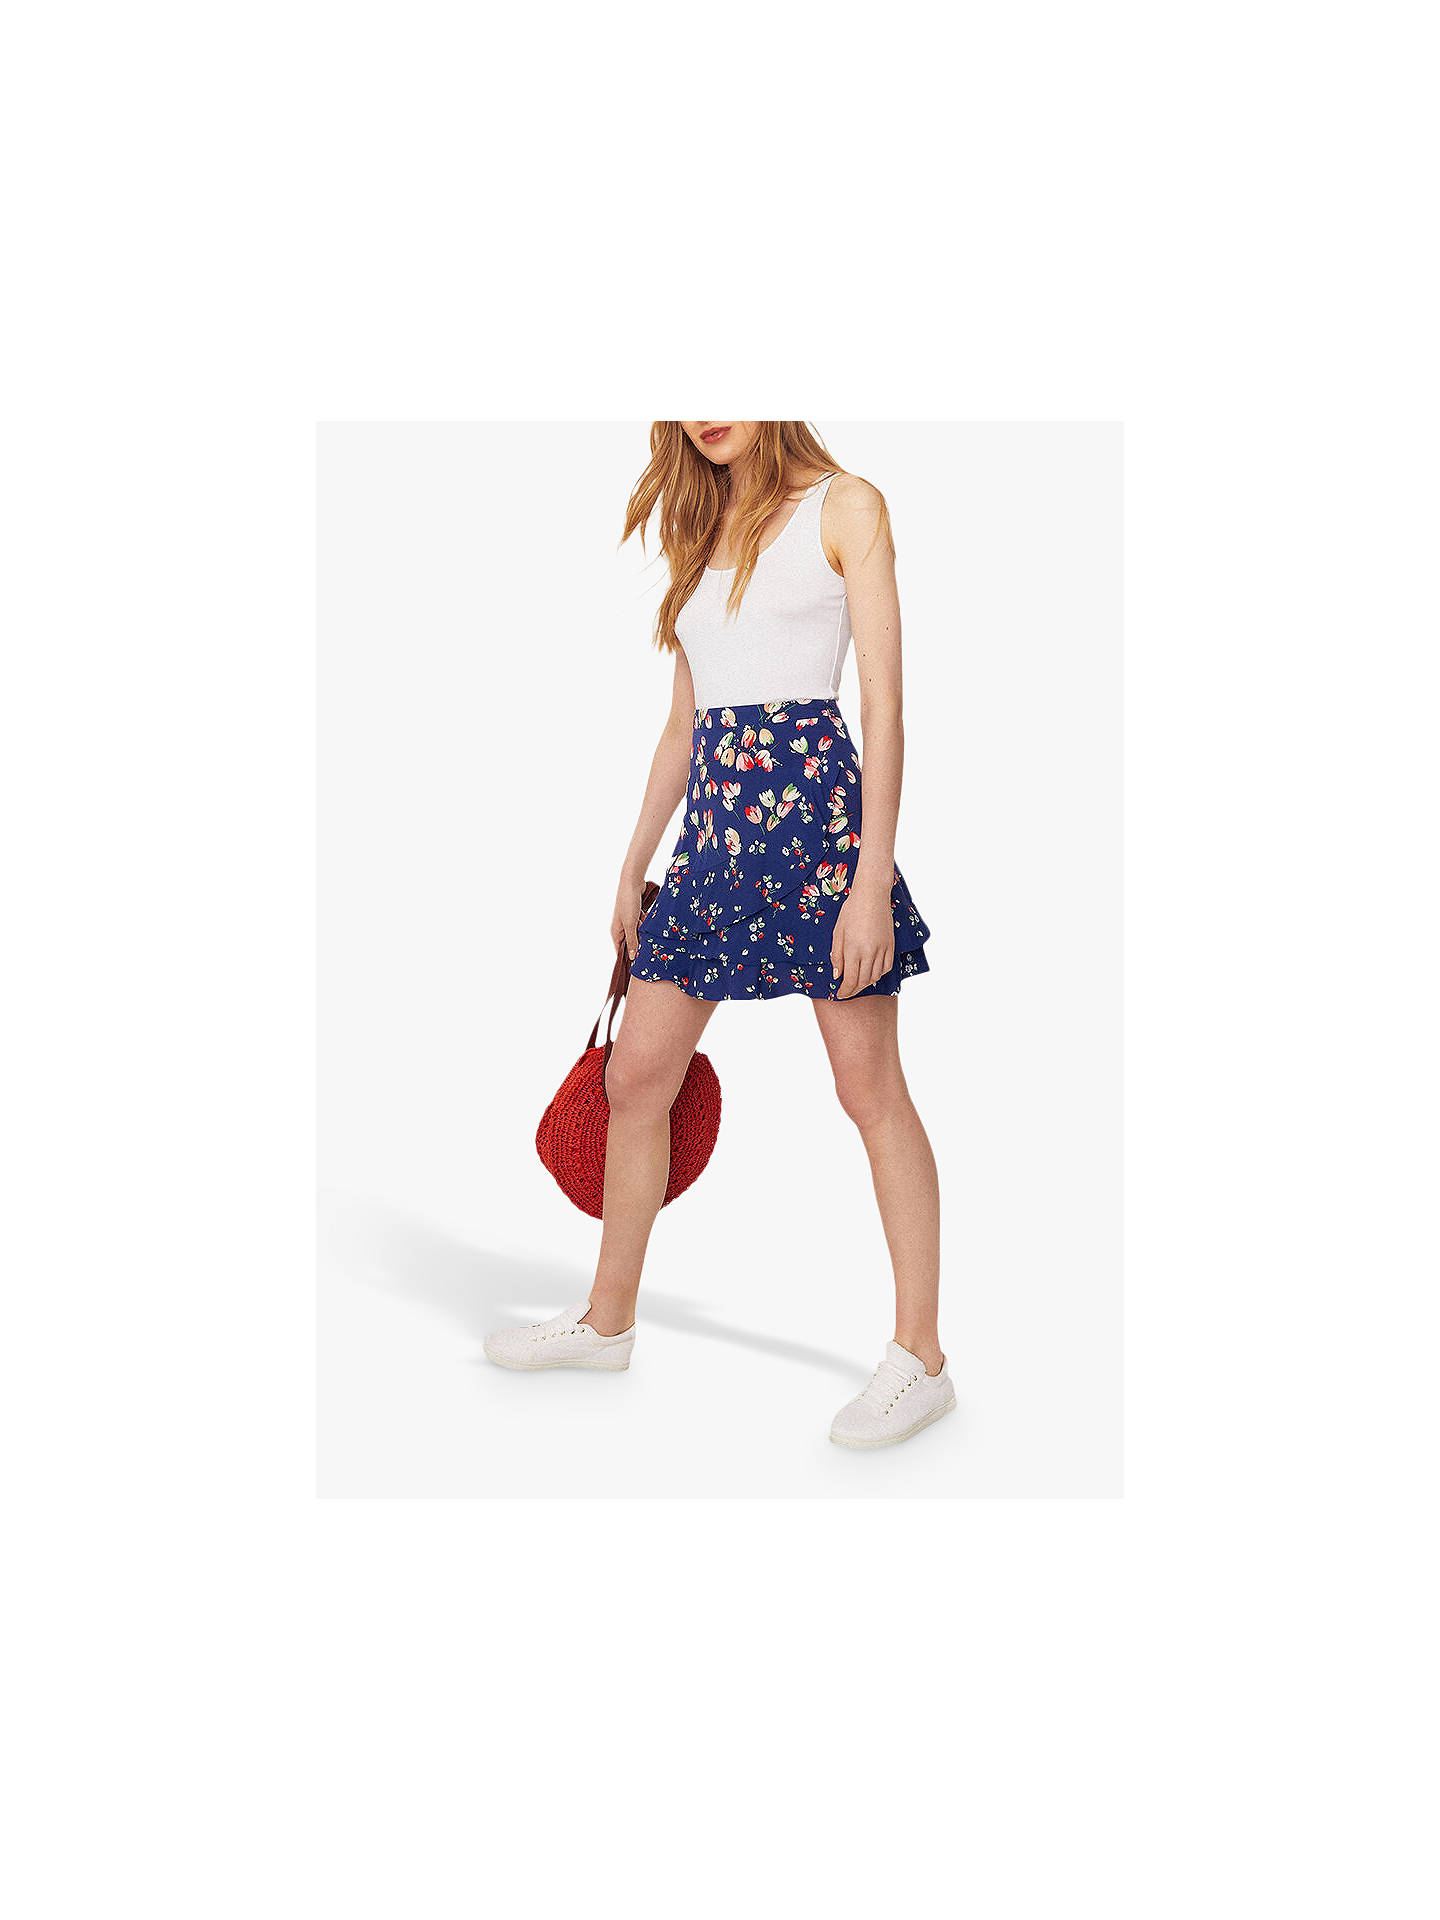 0c3e9fc9567 ... Buy Oasis Ditsy Print Ruffle Skirt, Multi Blue, 6 Online at  johnlewis.com ...